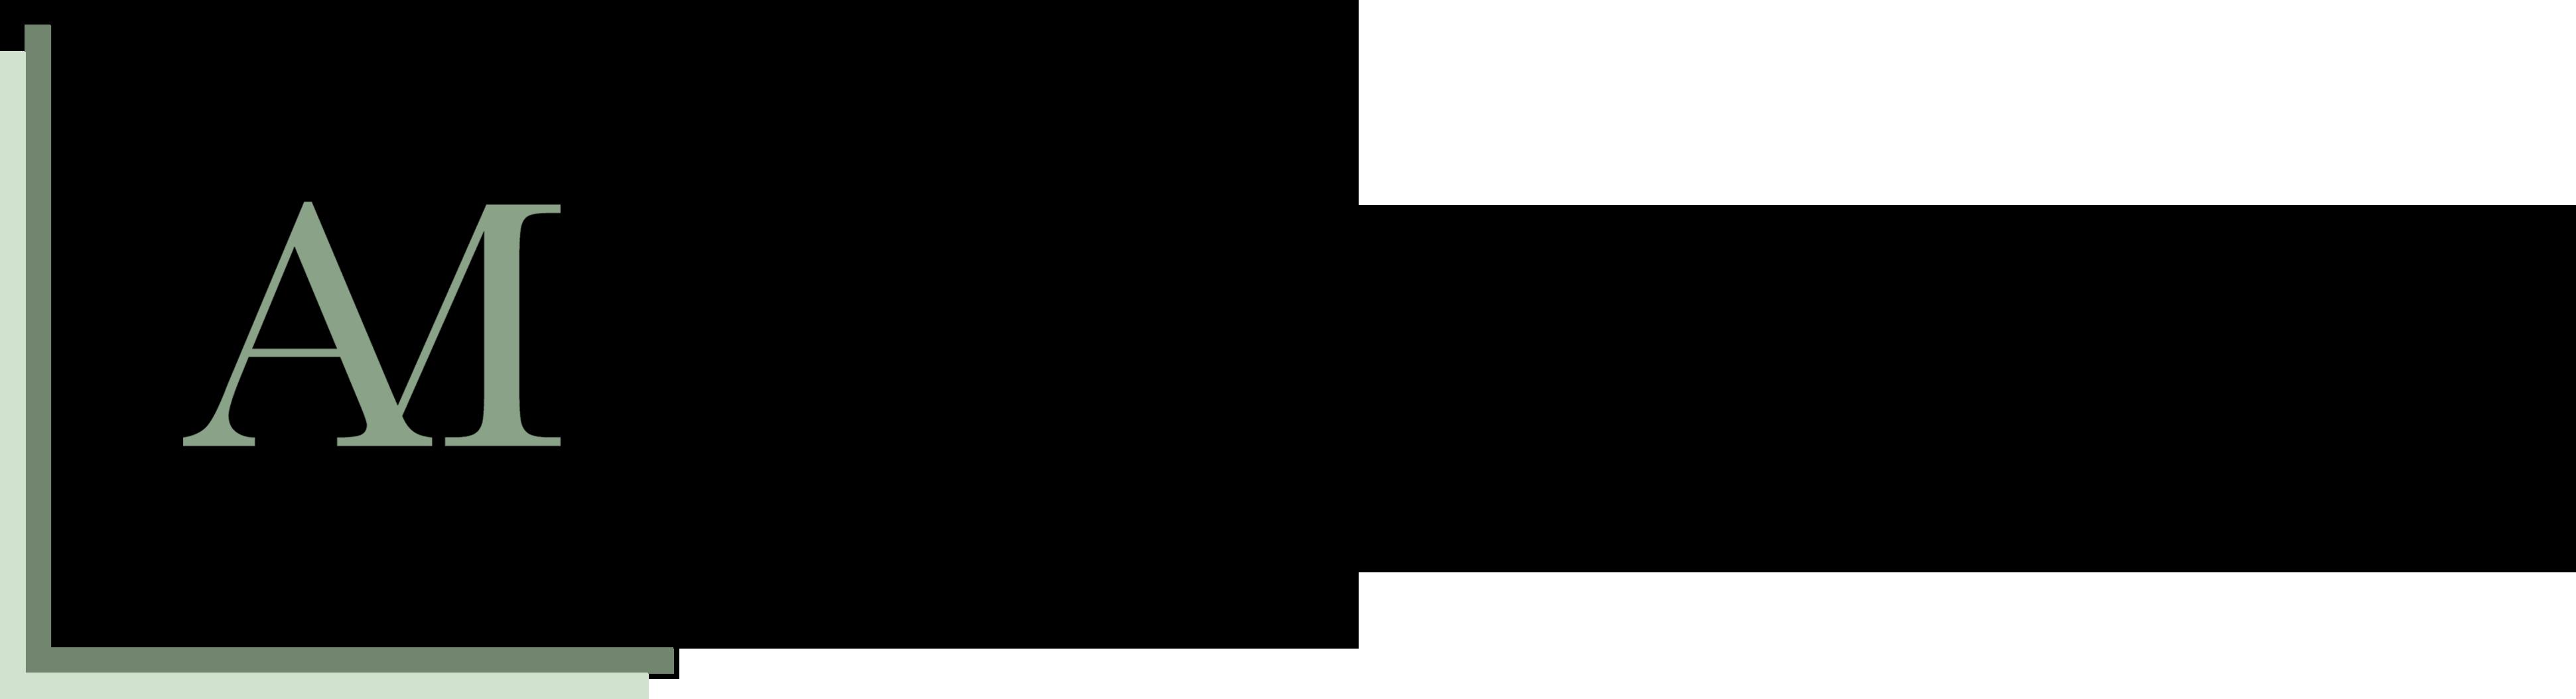 ACONMAN